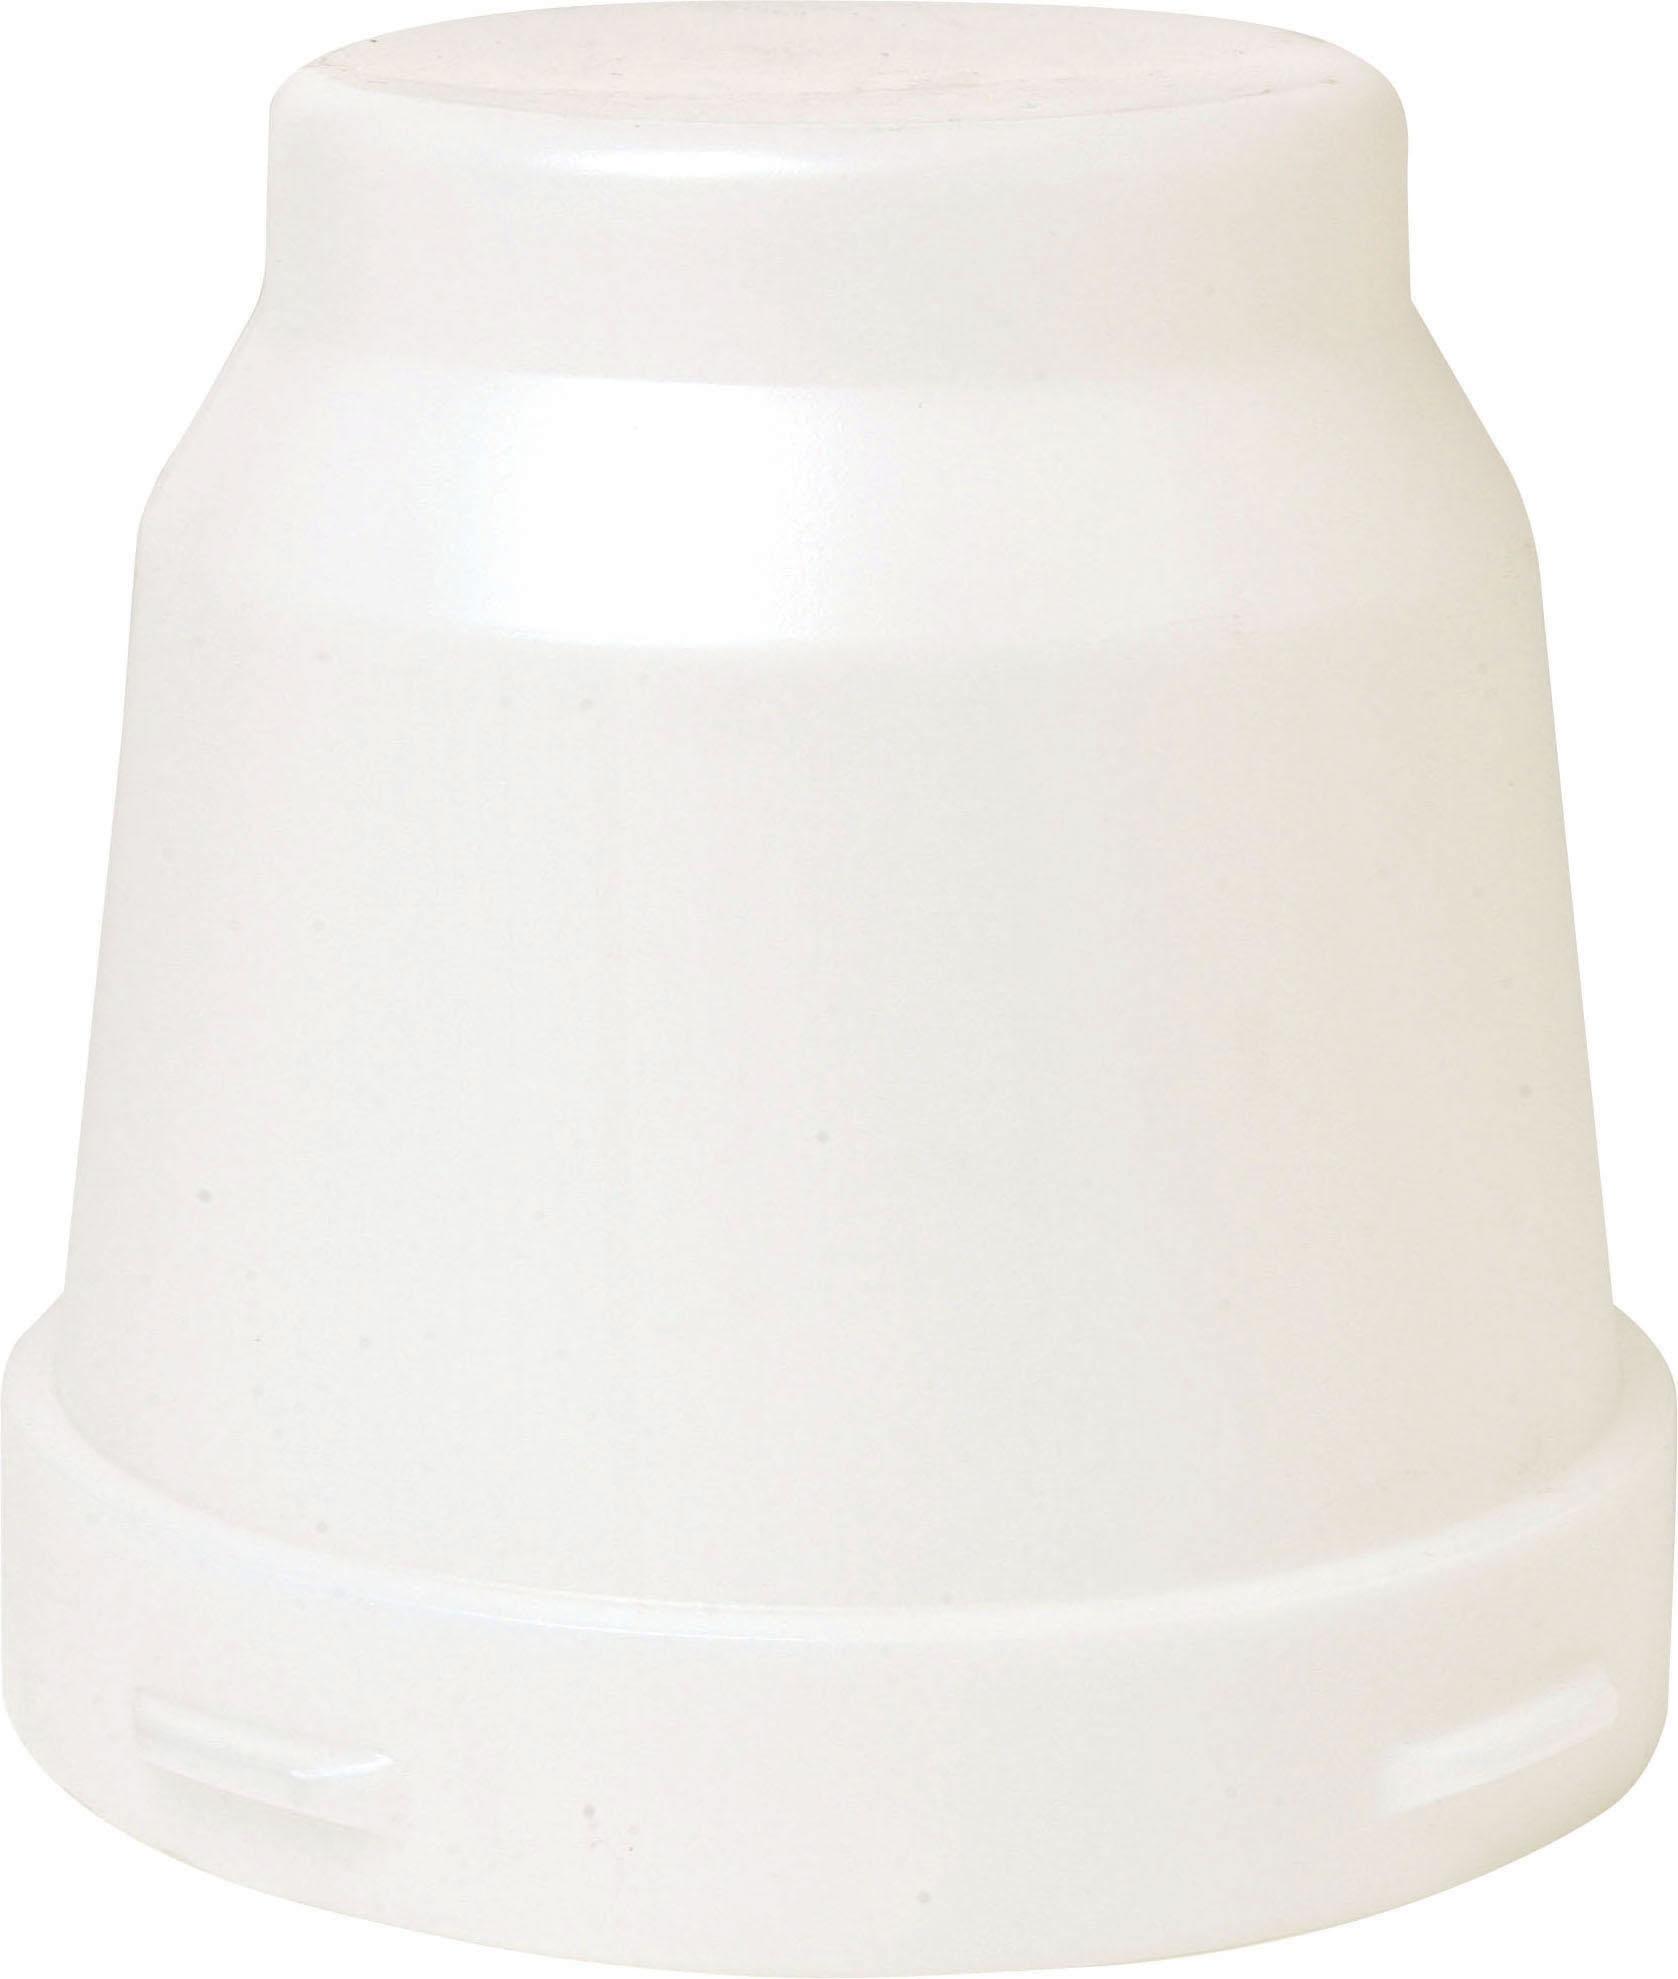 Miller Little Giant Lug Style Waterer Plastic Poultry Jar, 1-gallon